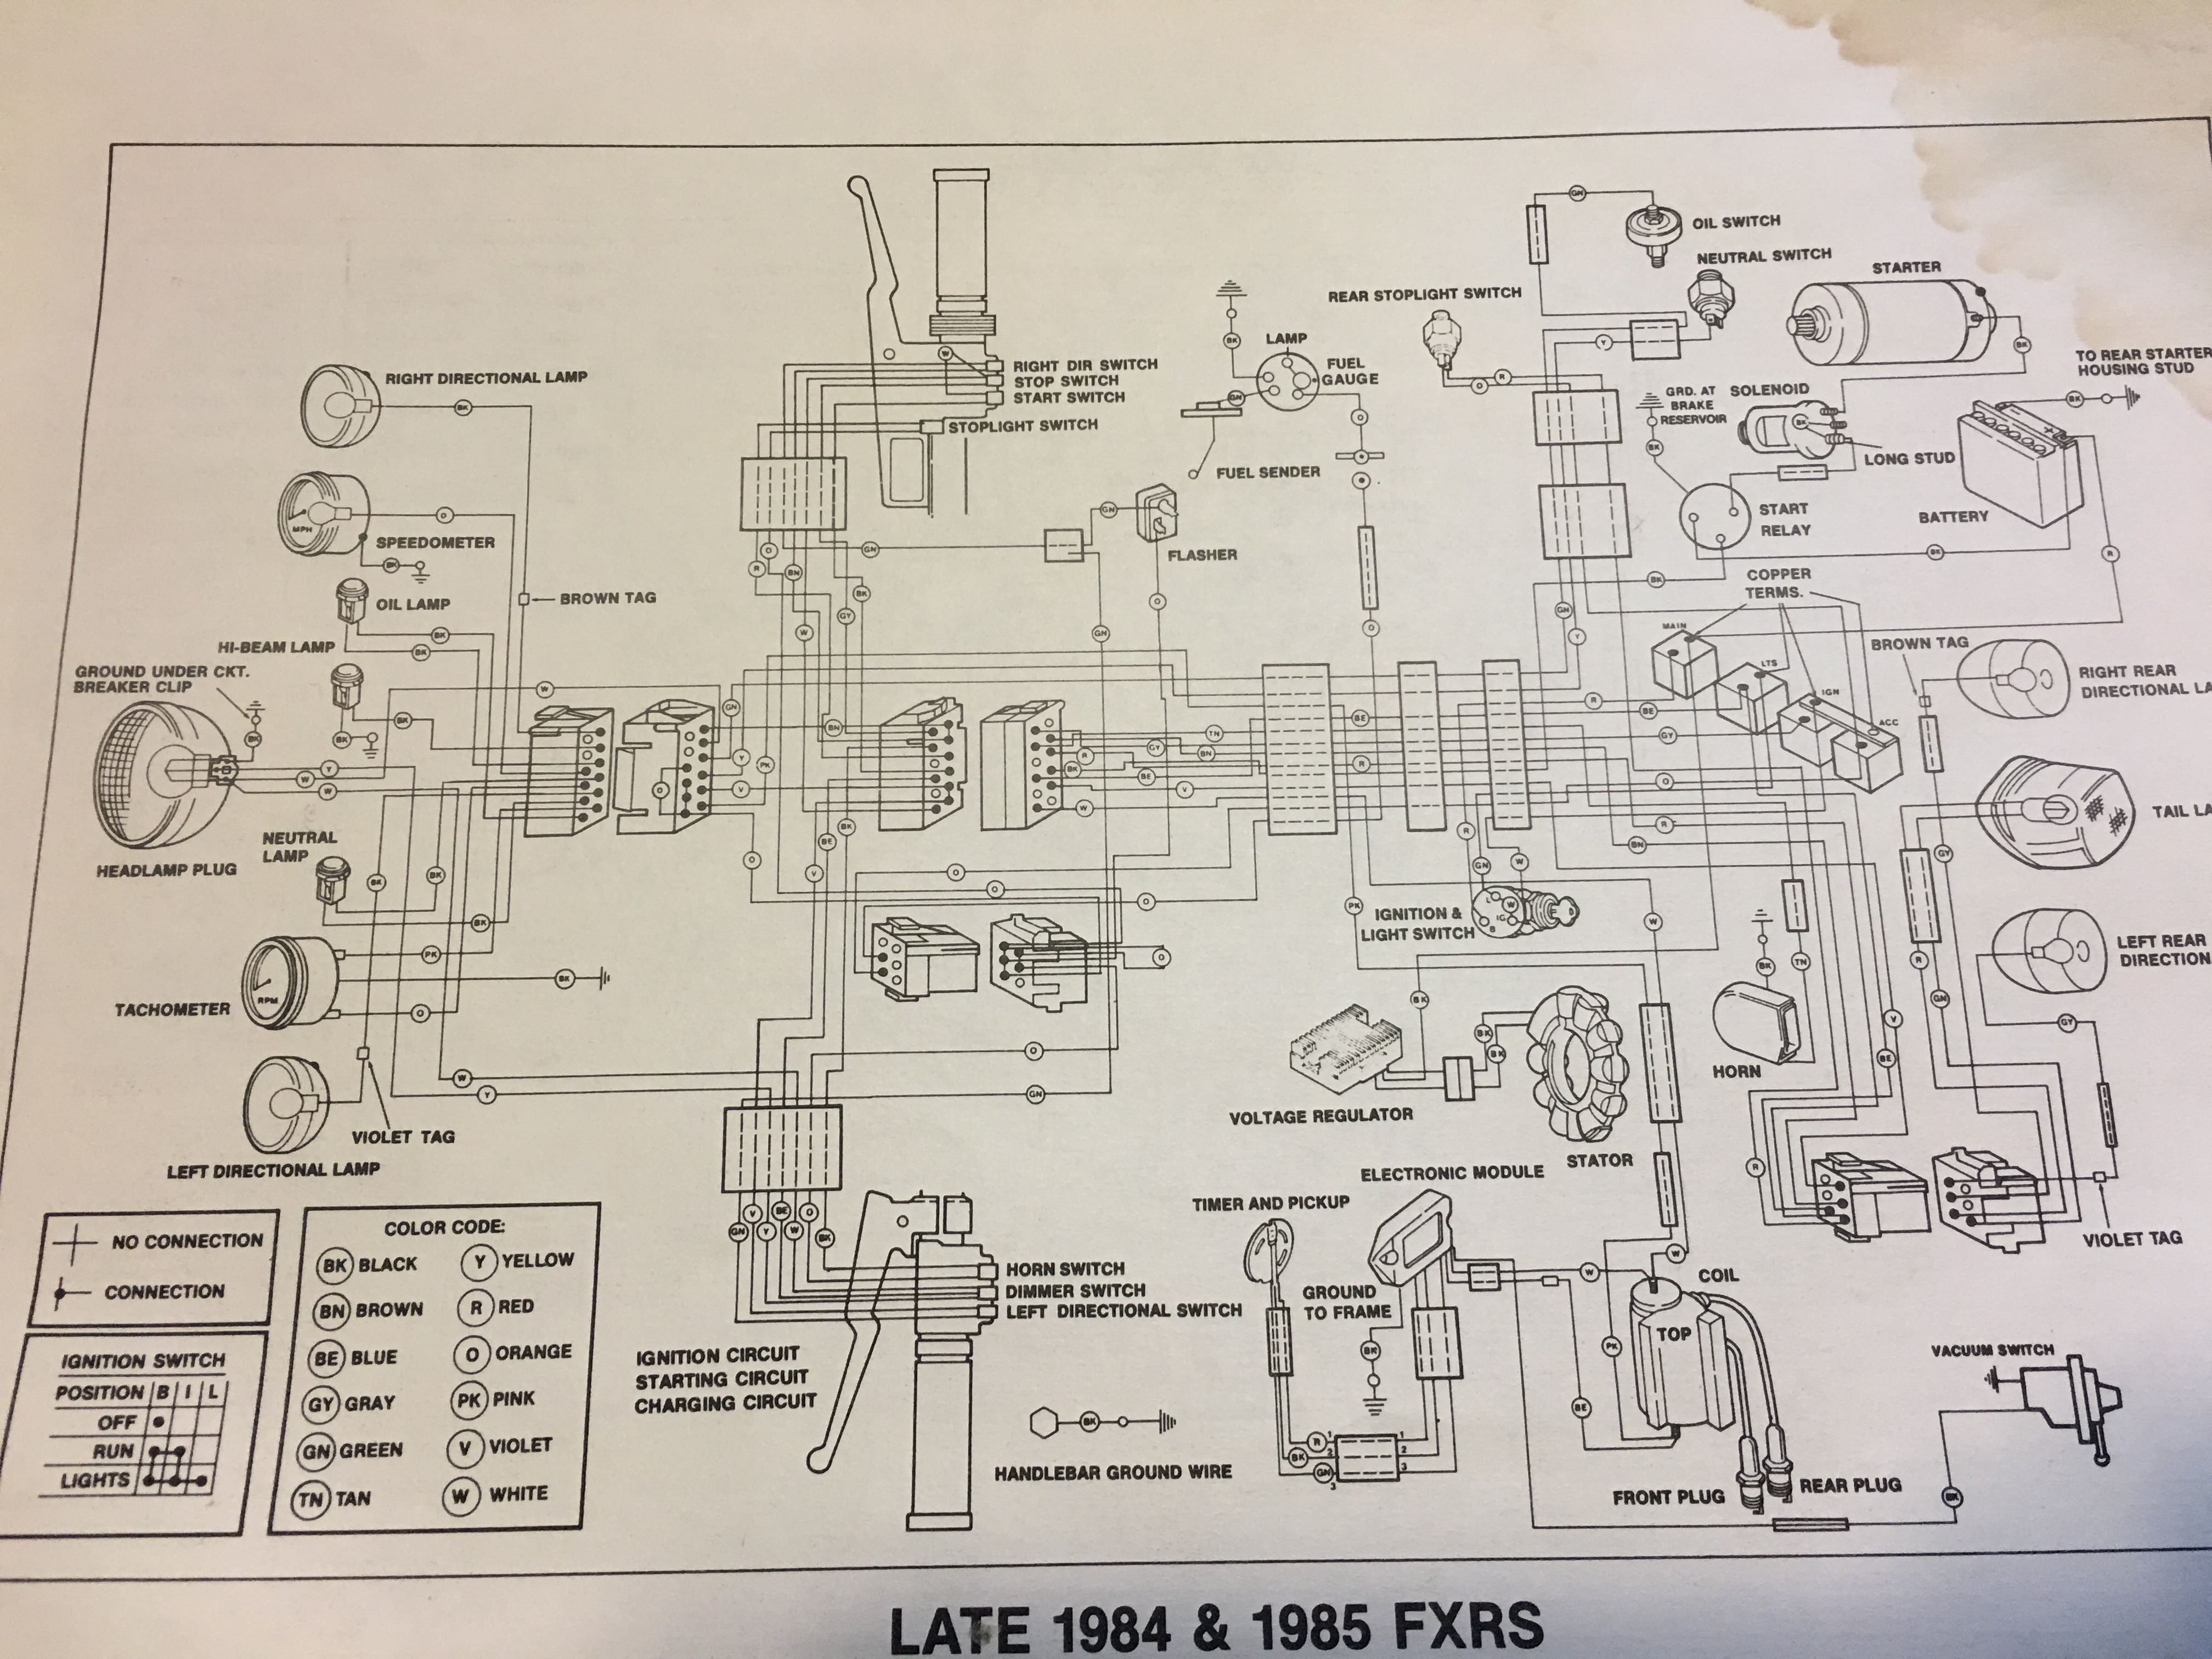 harley davidson wire diagram ge 7237  harley davidson fxr wiring diagram for 1990 free diagram harley davidson speed sensor wiring diagram harley davidson fxr wiring diagram for